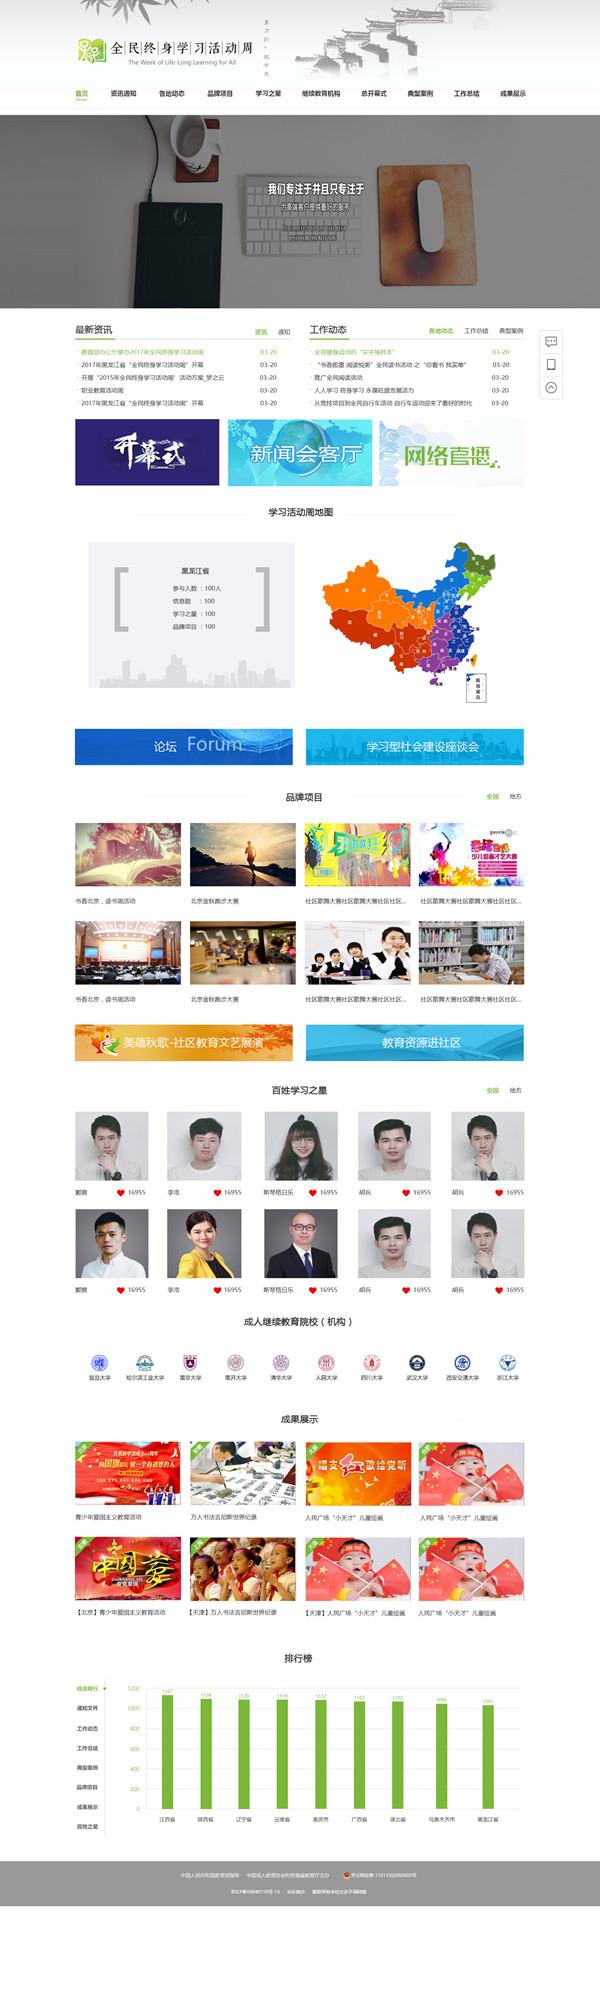 QQ图片20170930151303_副本.jpg